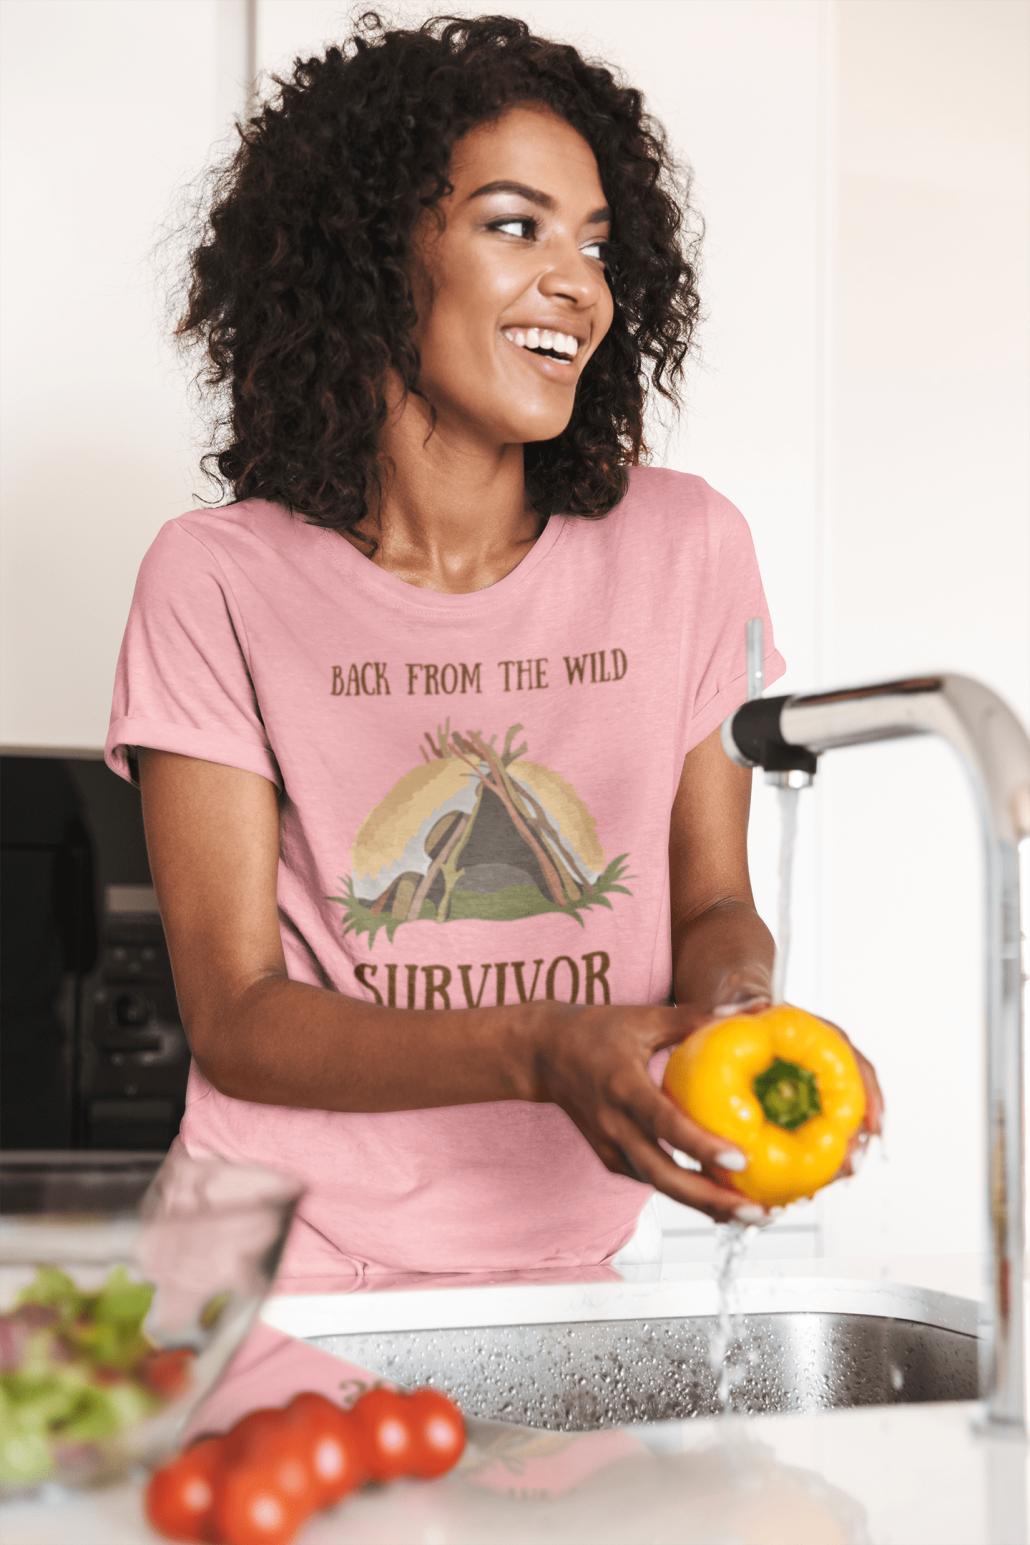 Women's T-shirt for outdoor survivors